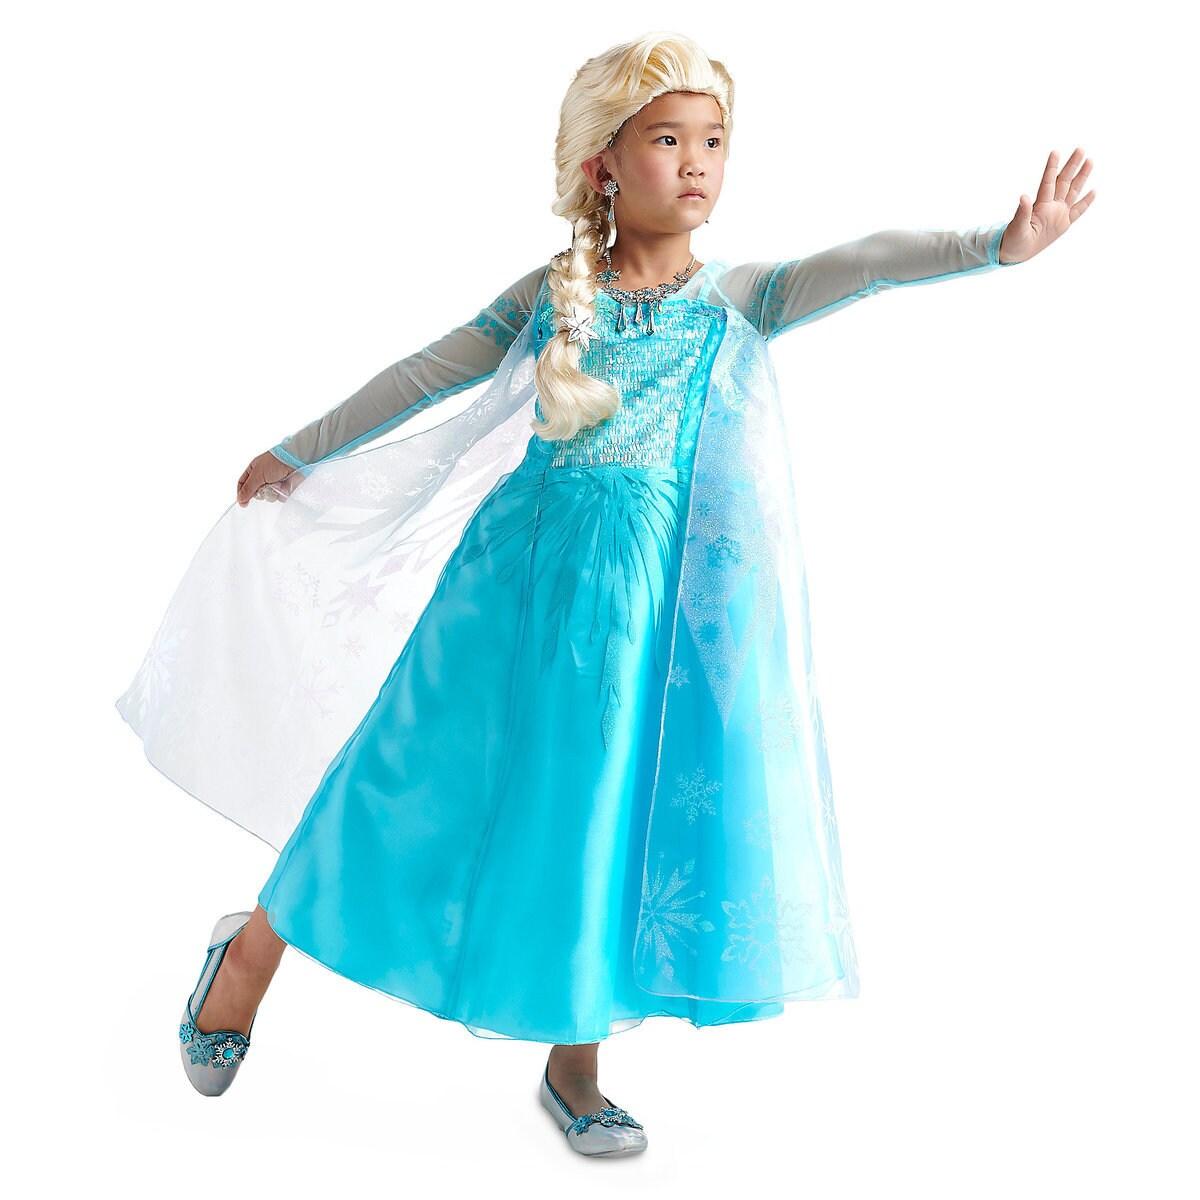 4b283c5441c Product Image of Elsa Costume for Kids - Frozen   2